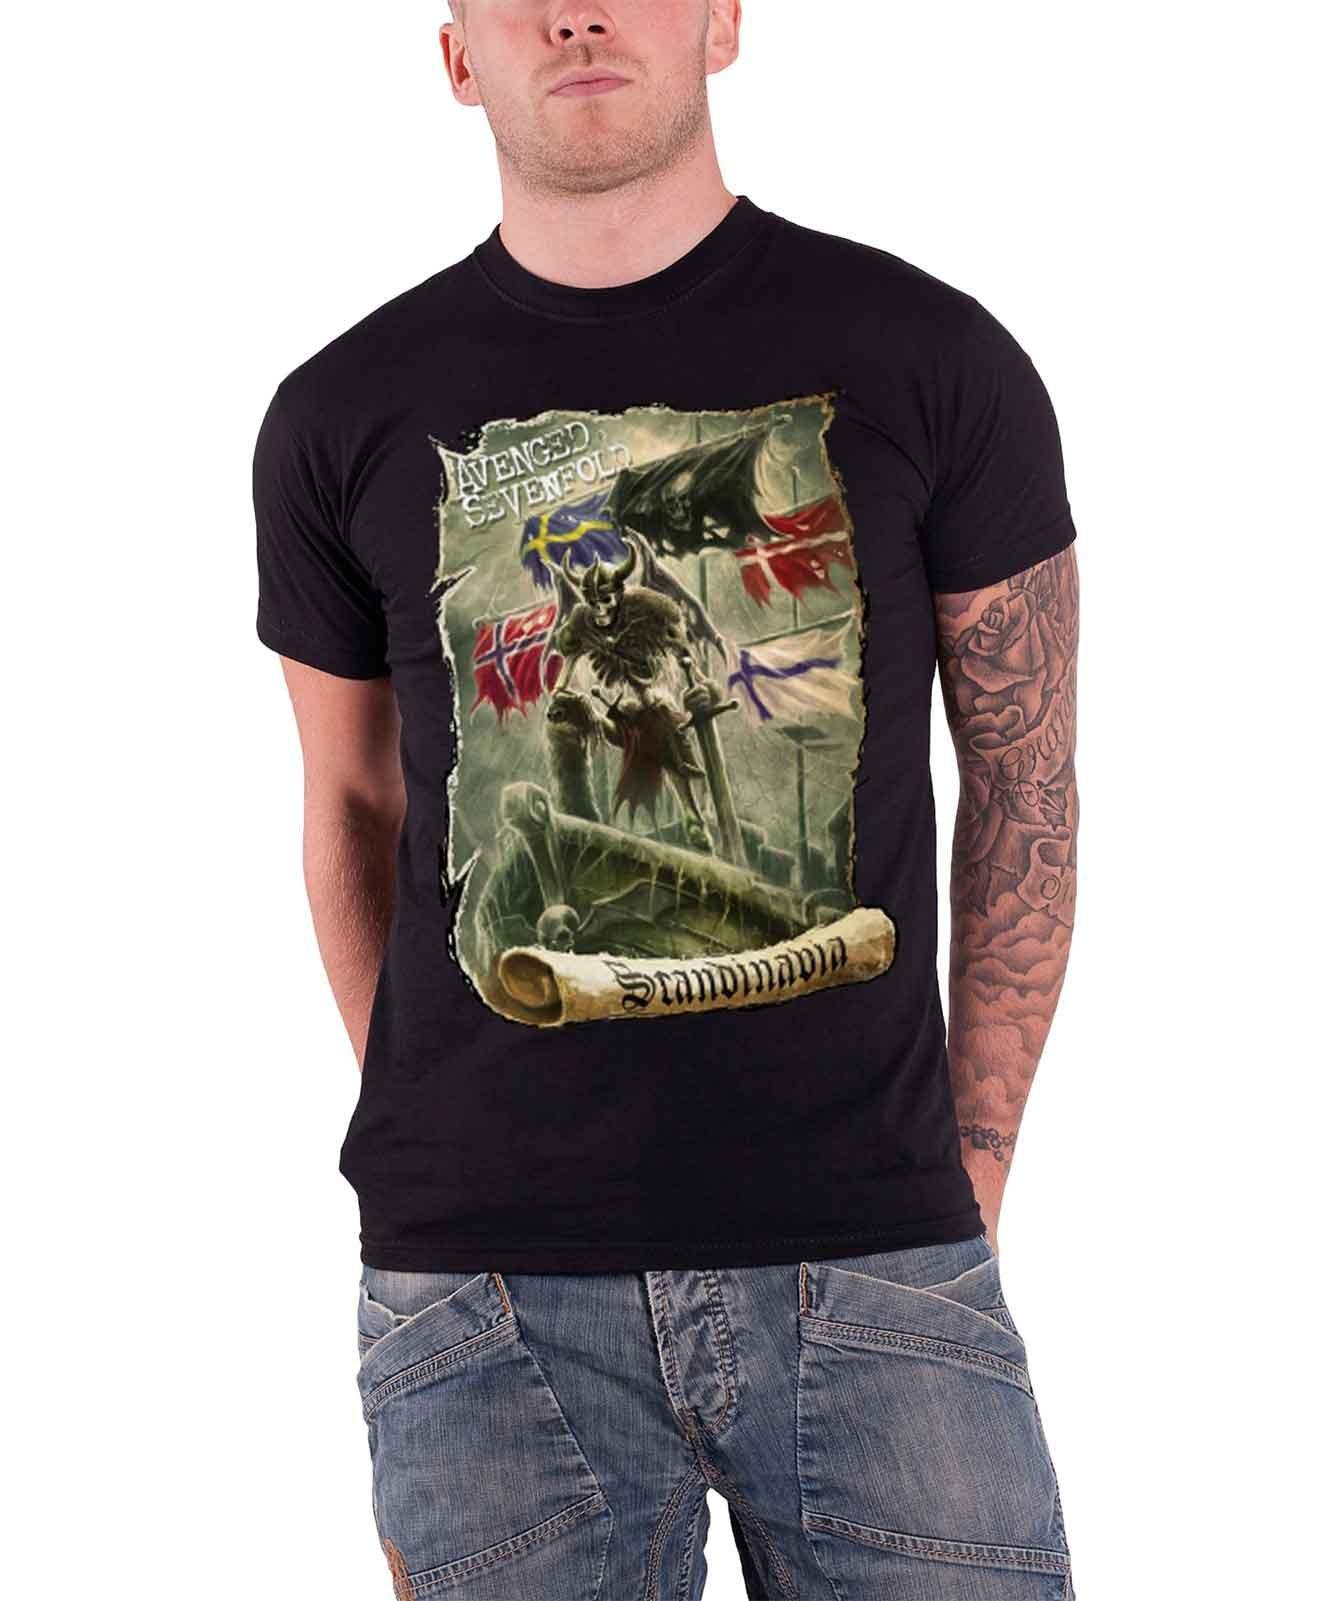 Avenged Sevenfold Scandinavia S T Shirt 8090